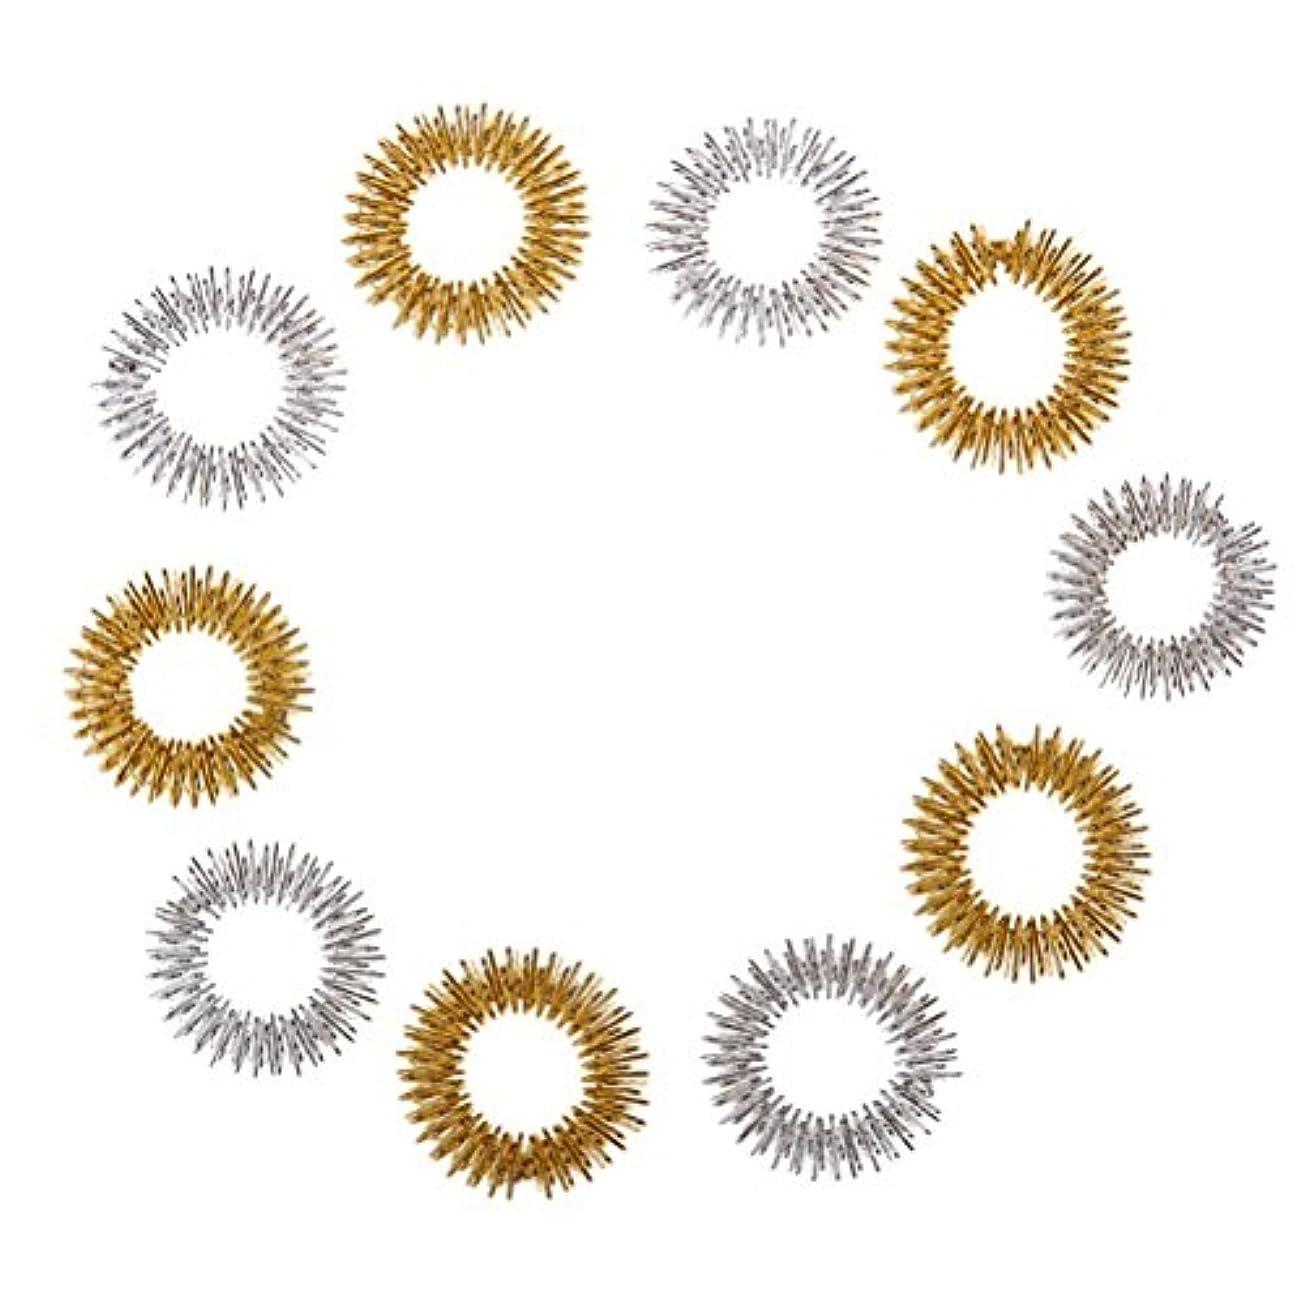 Healifty 10個指圧マッサージリング子供のための指の循環リング十代の若者たちの大人(ランダムカラー)